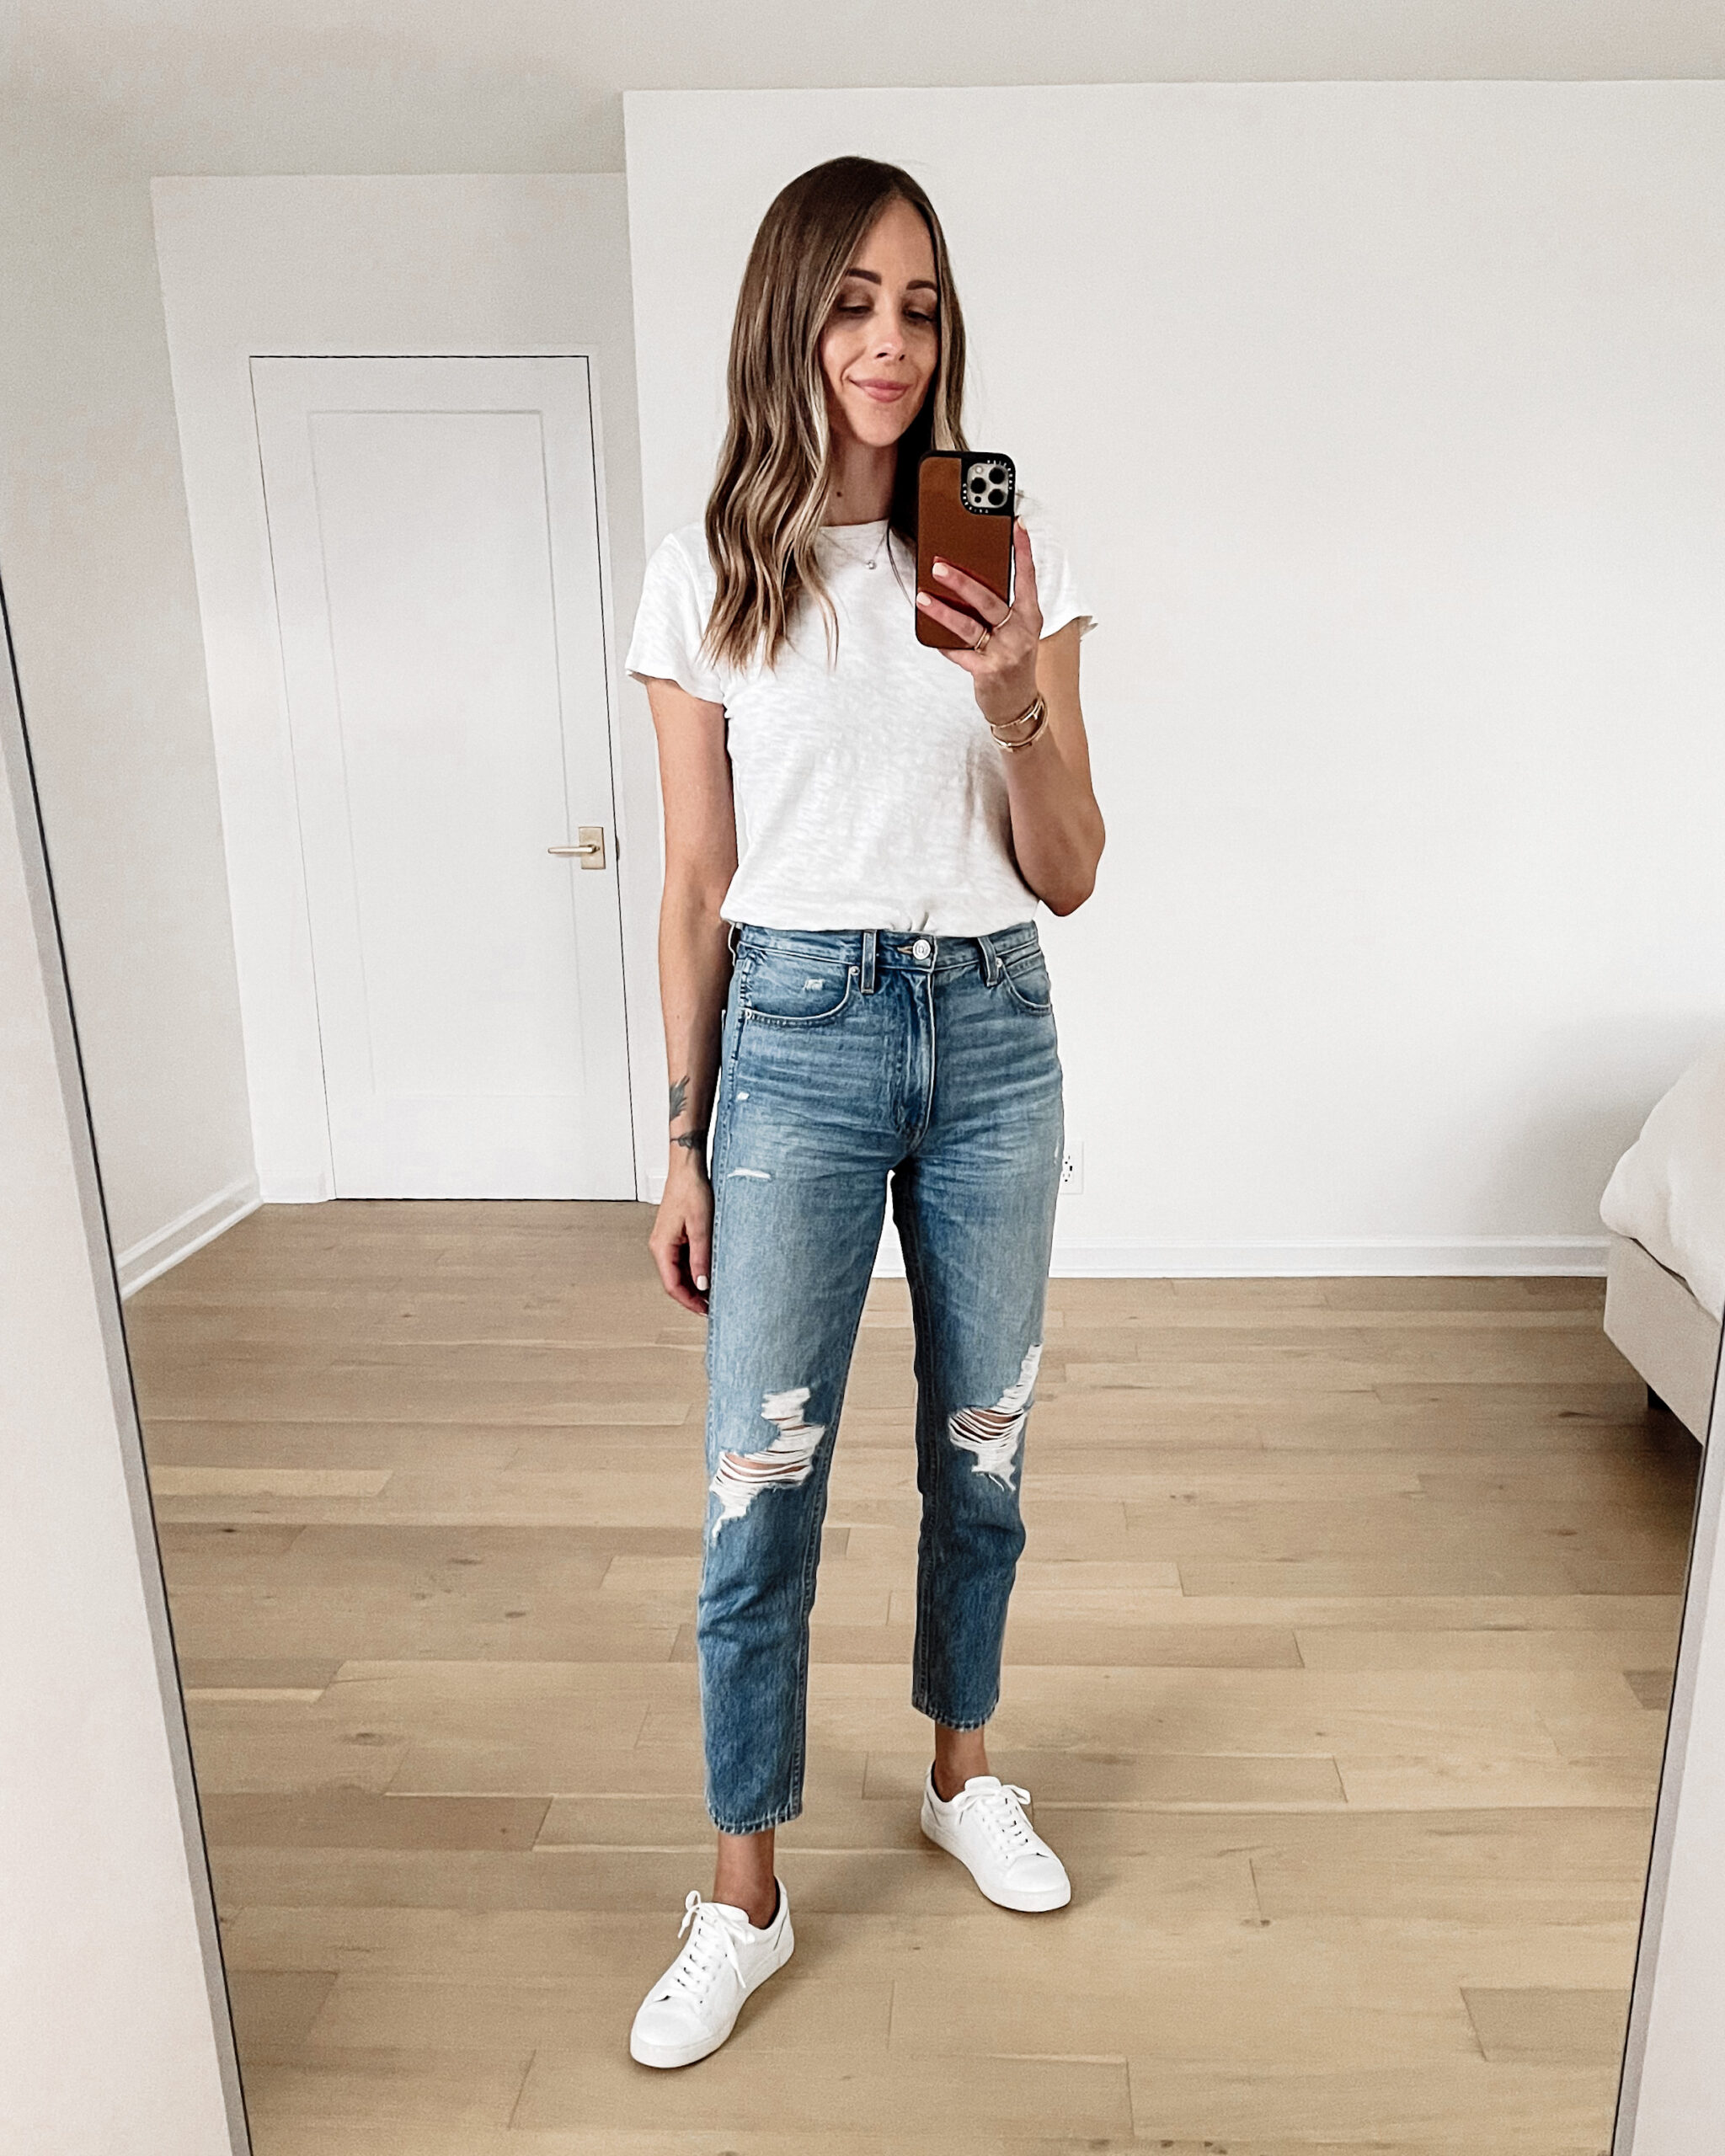 Fashion Jackson Wearing ATM White Tshirt SLVRLAKE Virginia Slim Ripped Jeans Frye White Sneakers